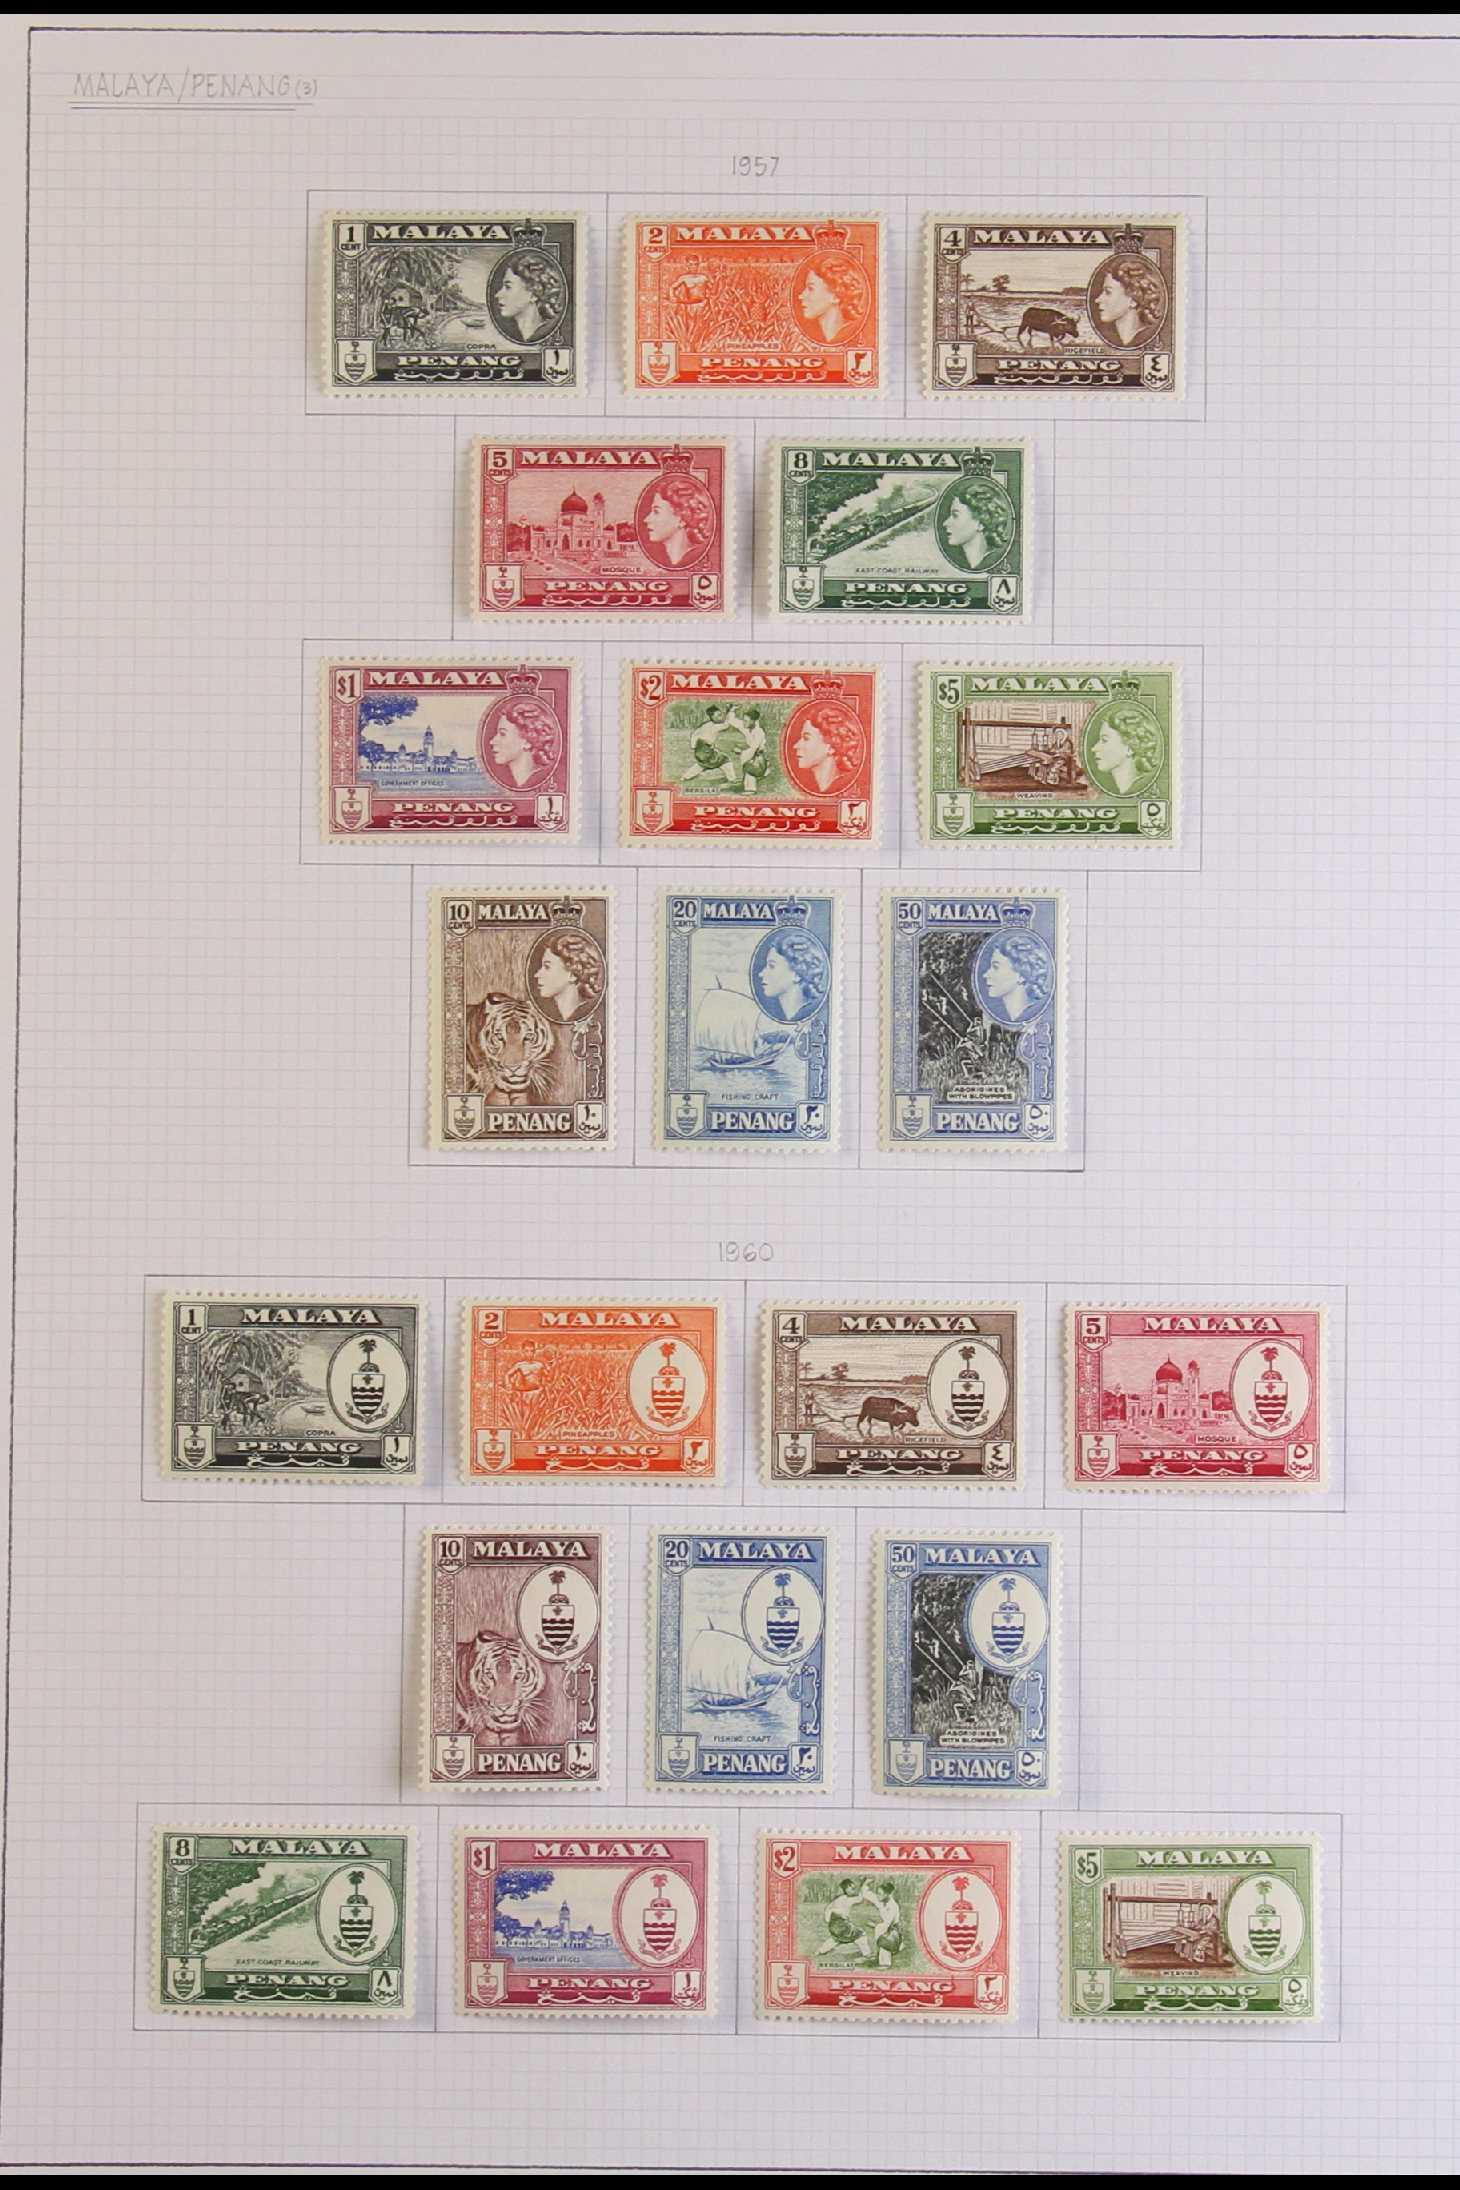 MALAYA STATES PENANG 1953-1960 fine mint complete SG 27/65, includes 1954-57 QEII set, plus4c & - Image 4 of 4